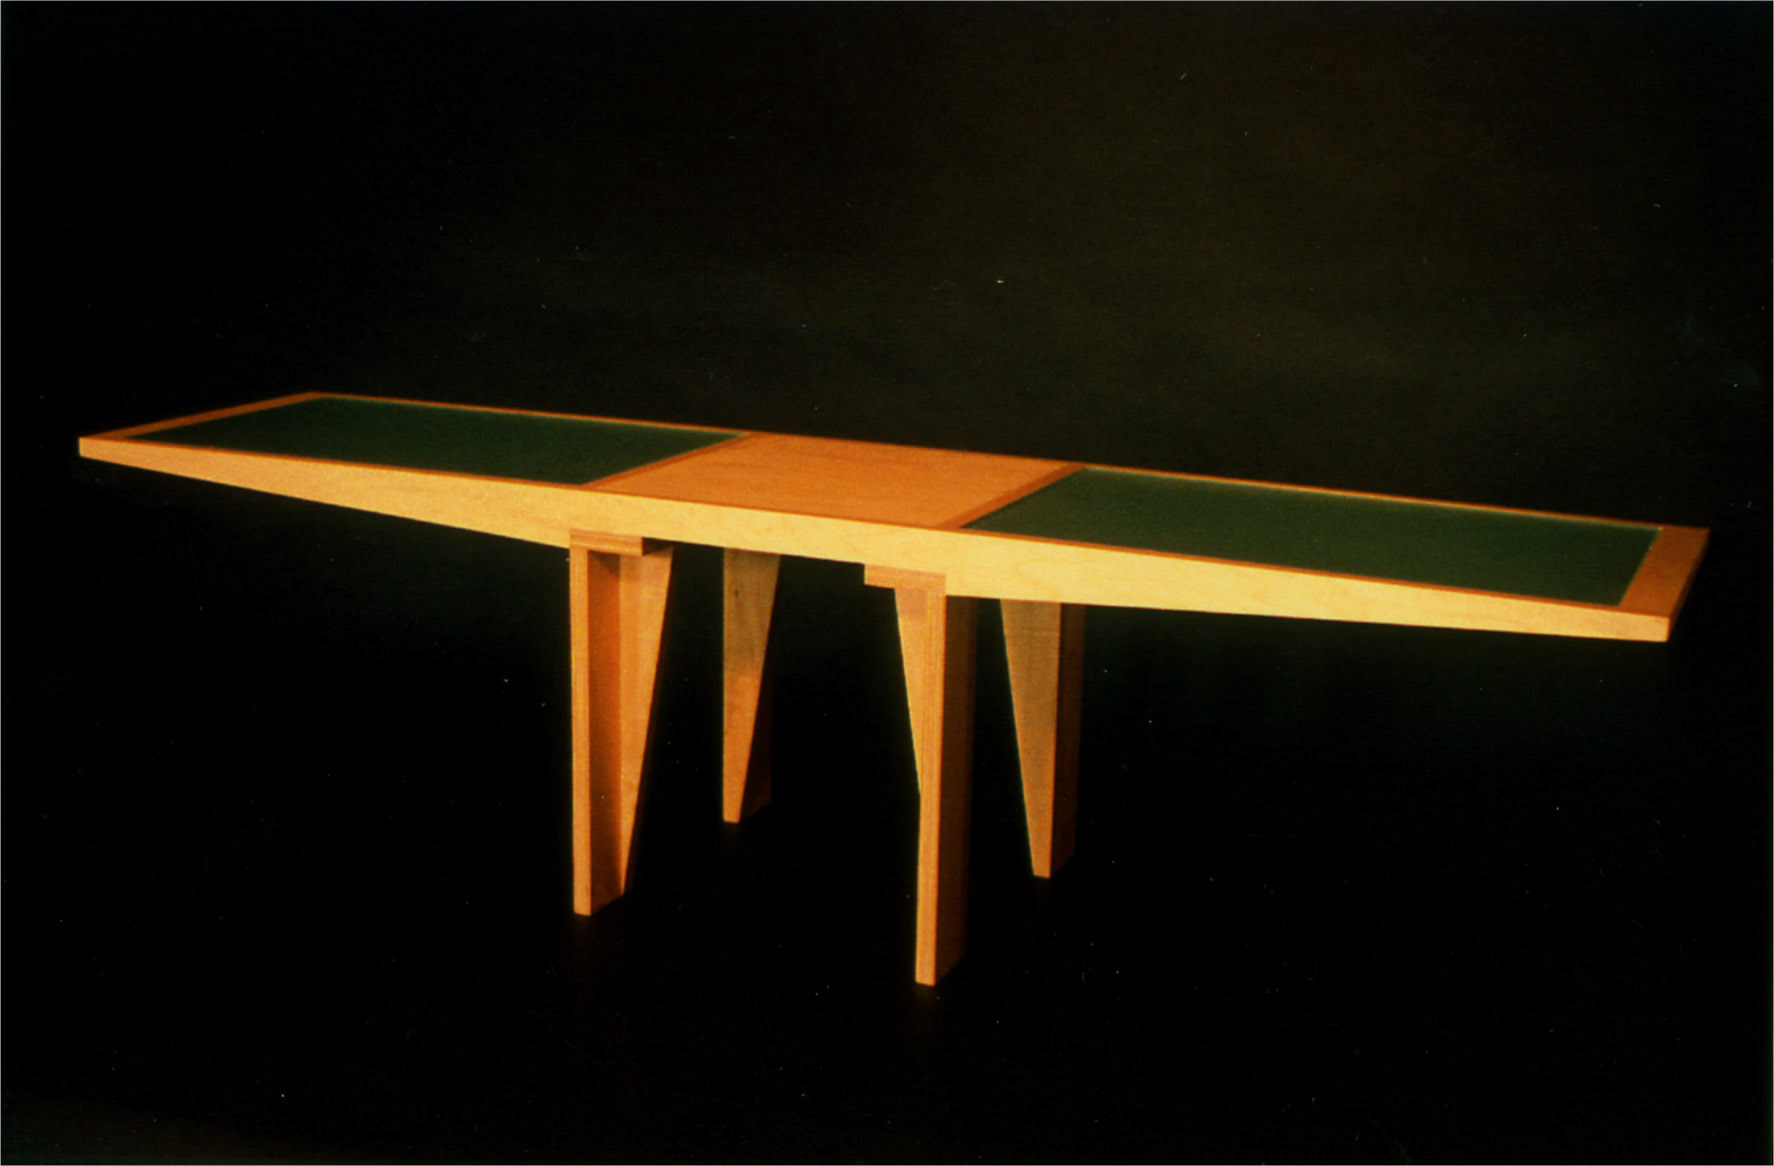 Furniture Glyph Wing Table 3.jpg